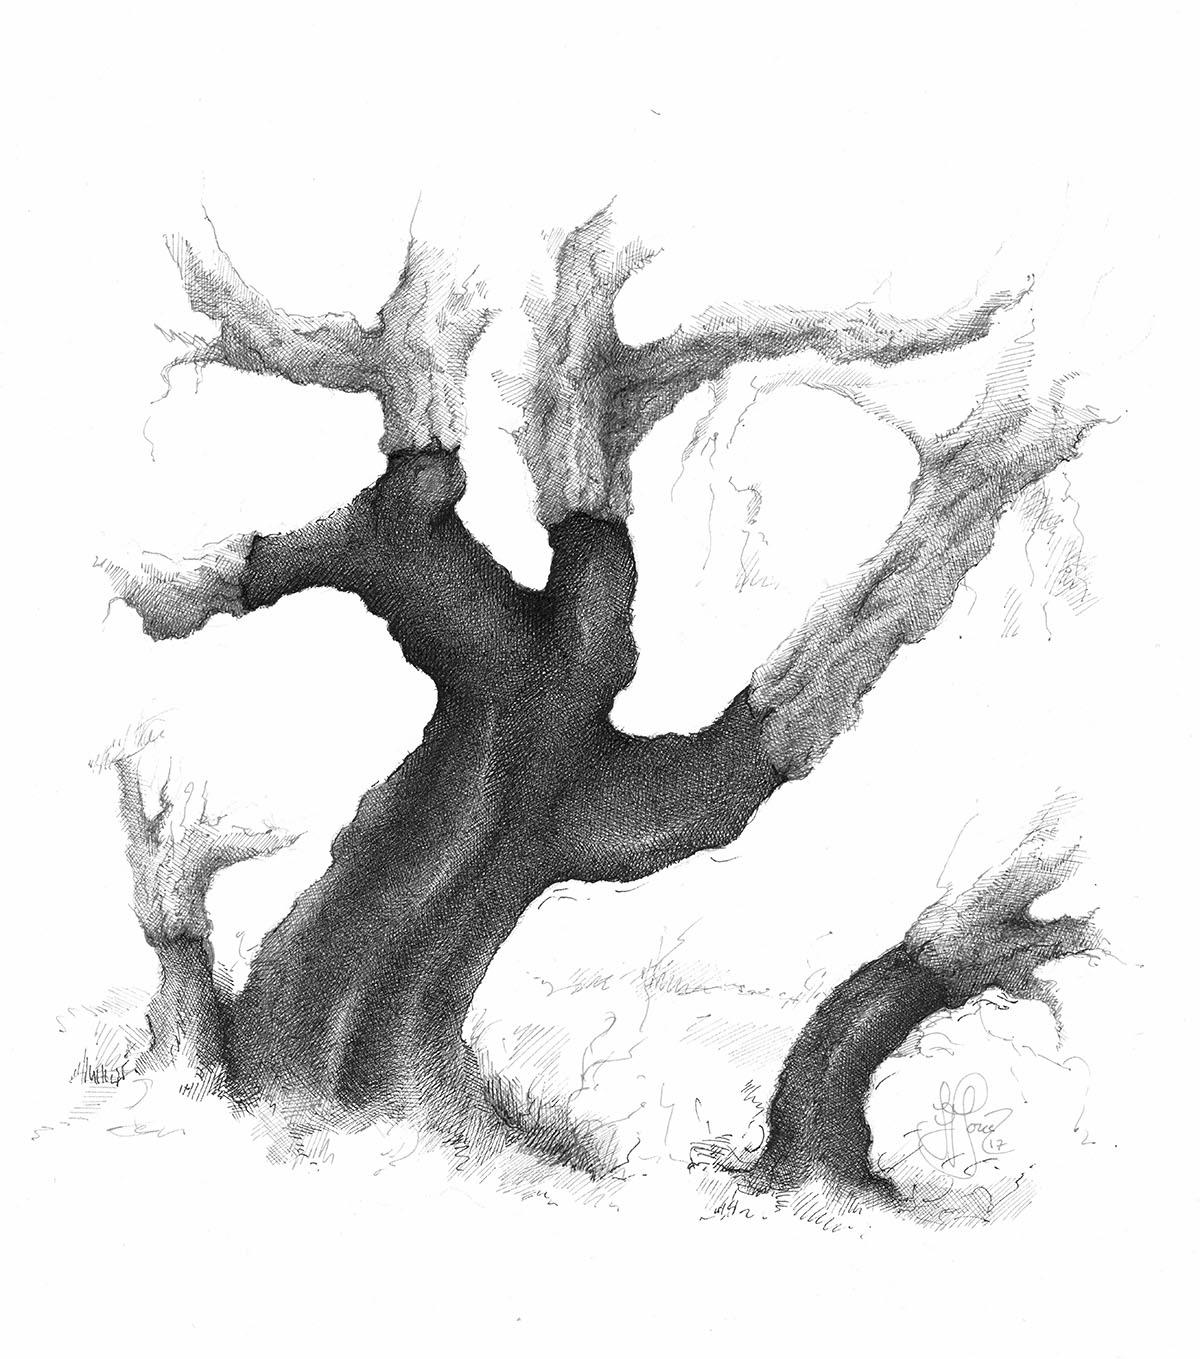 QUERCUS SUBER - Cork oak - Pen & Ink.